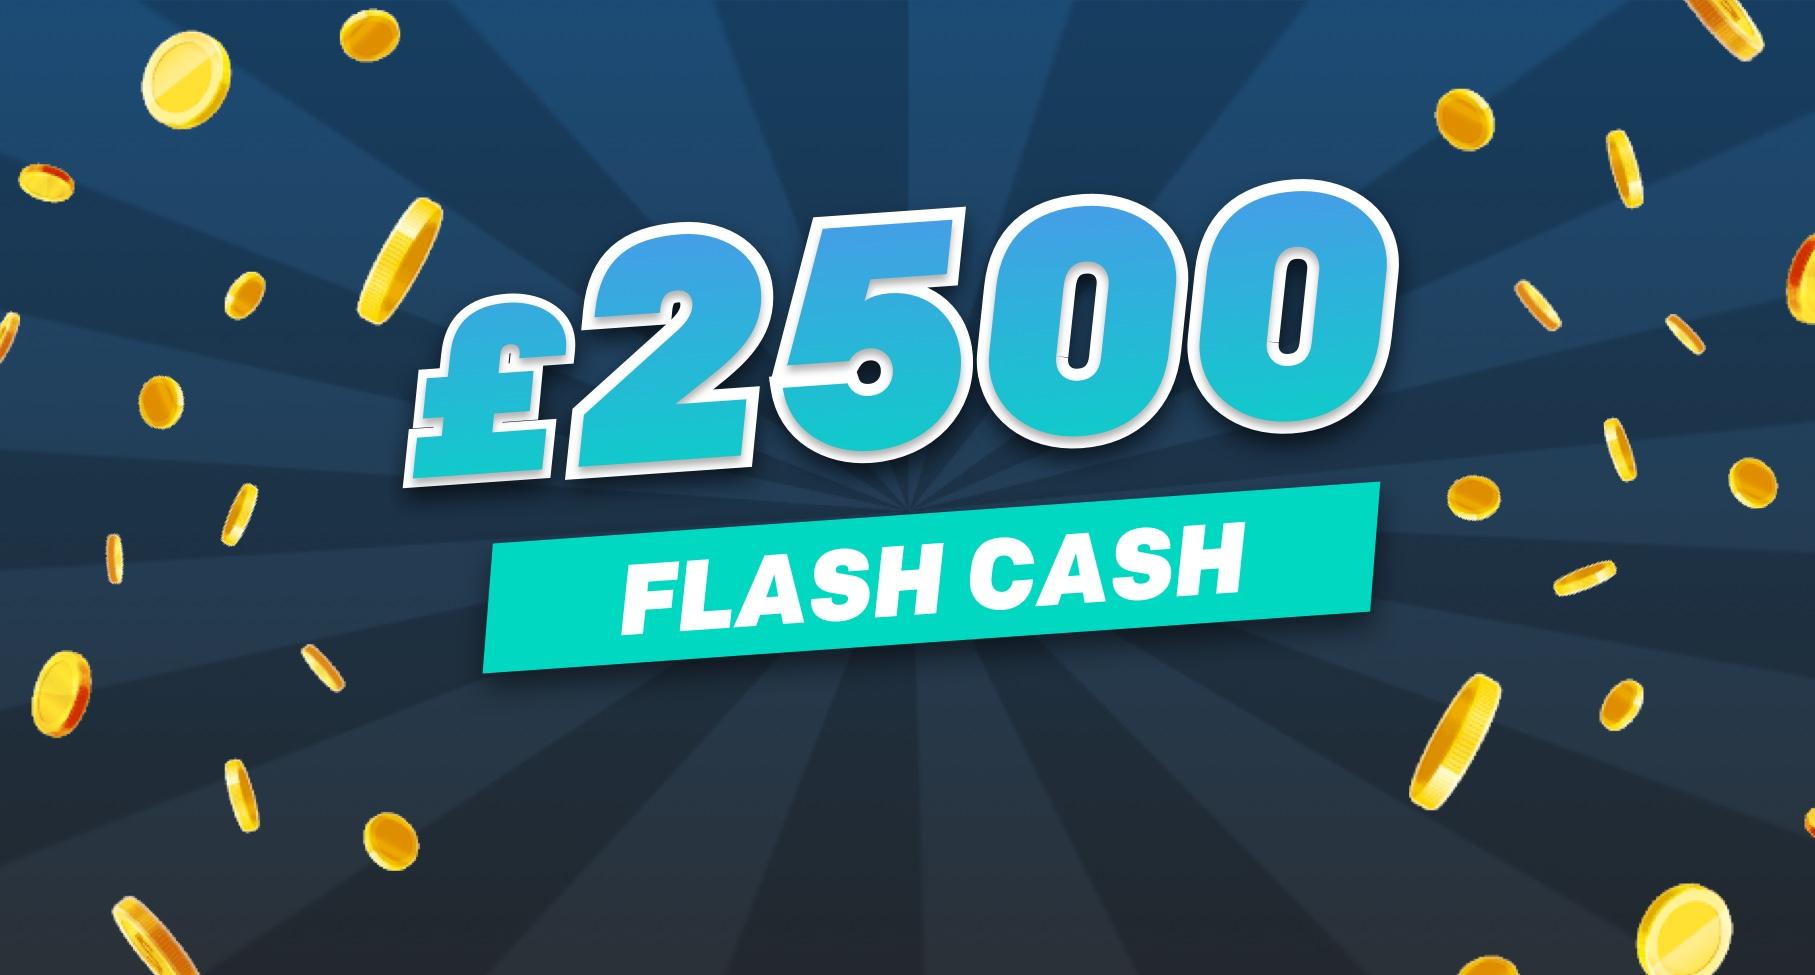 £2500 Flash Cash